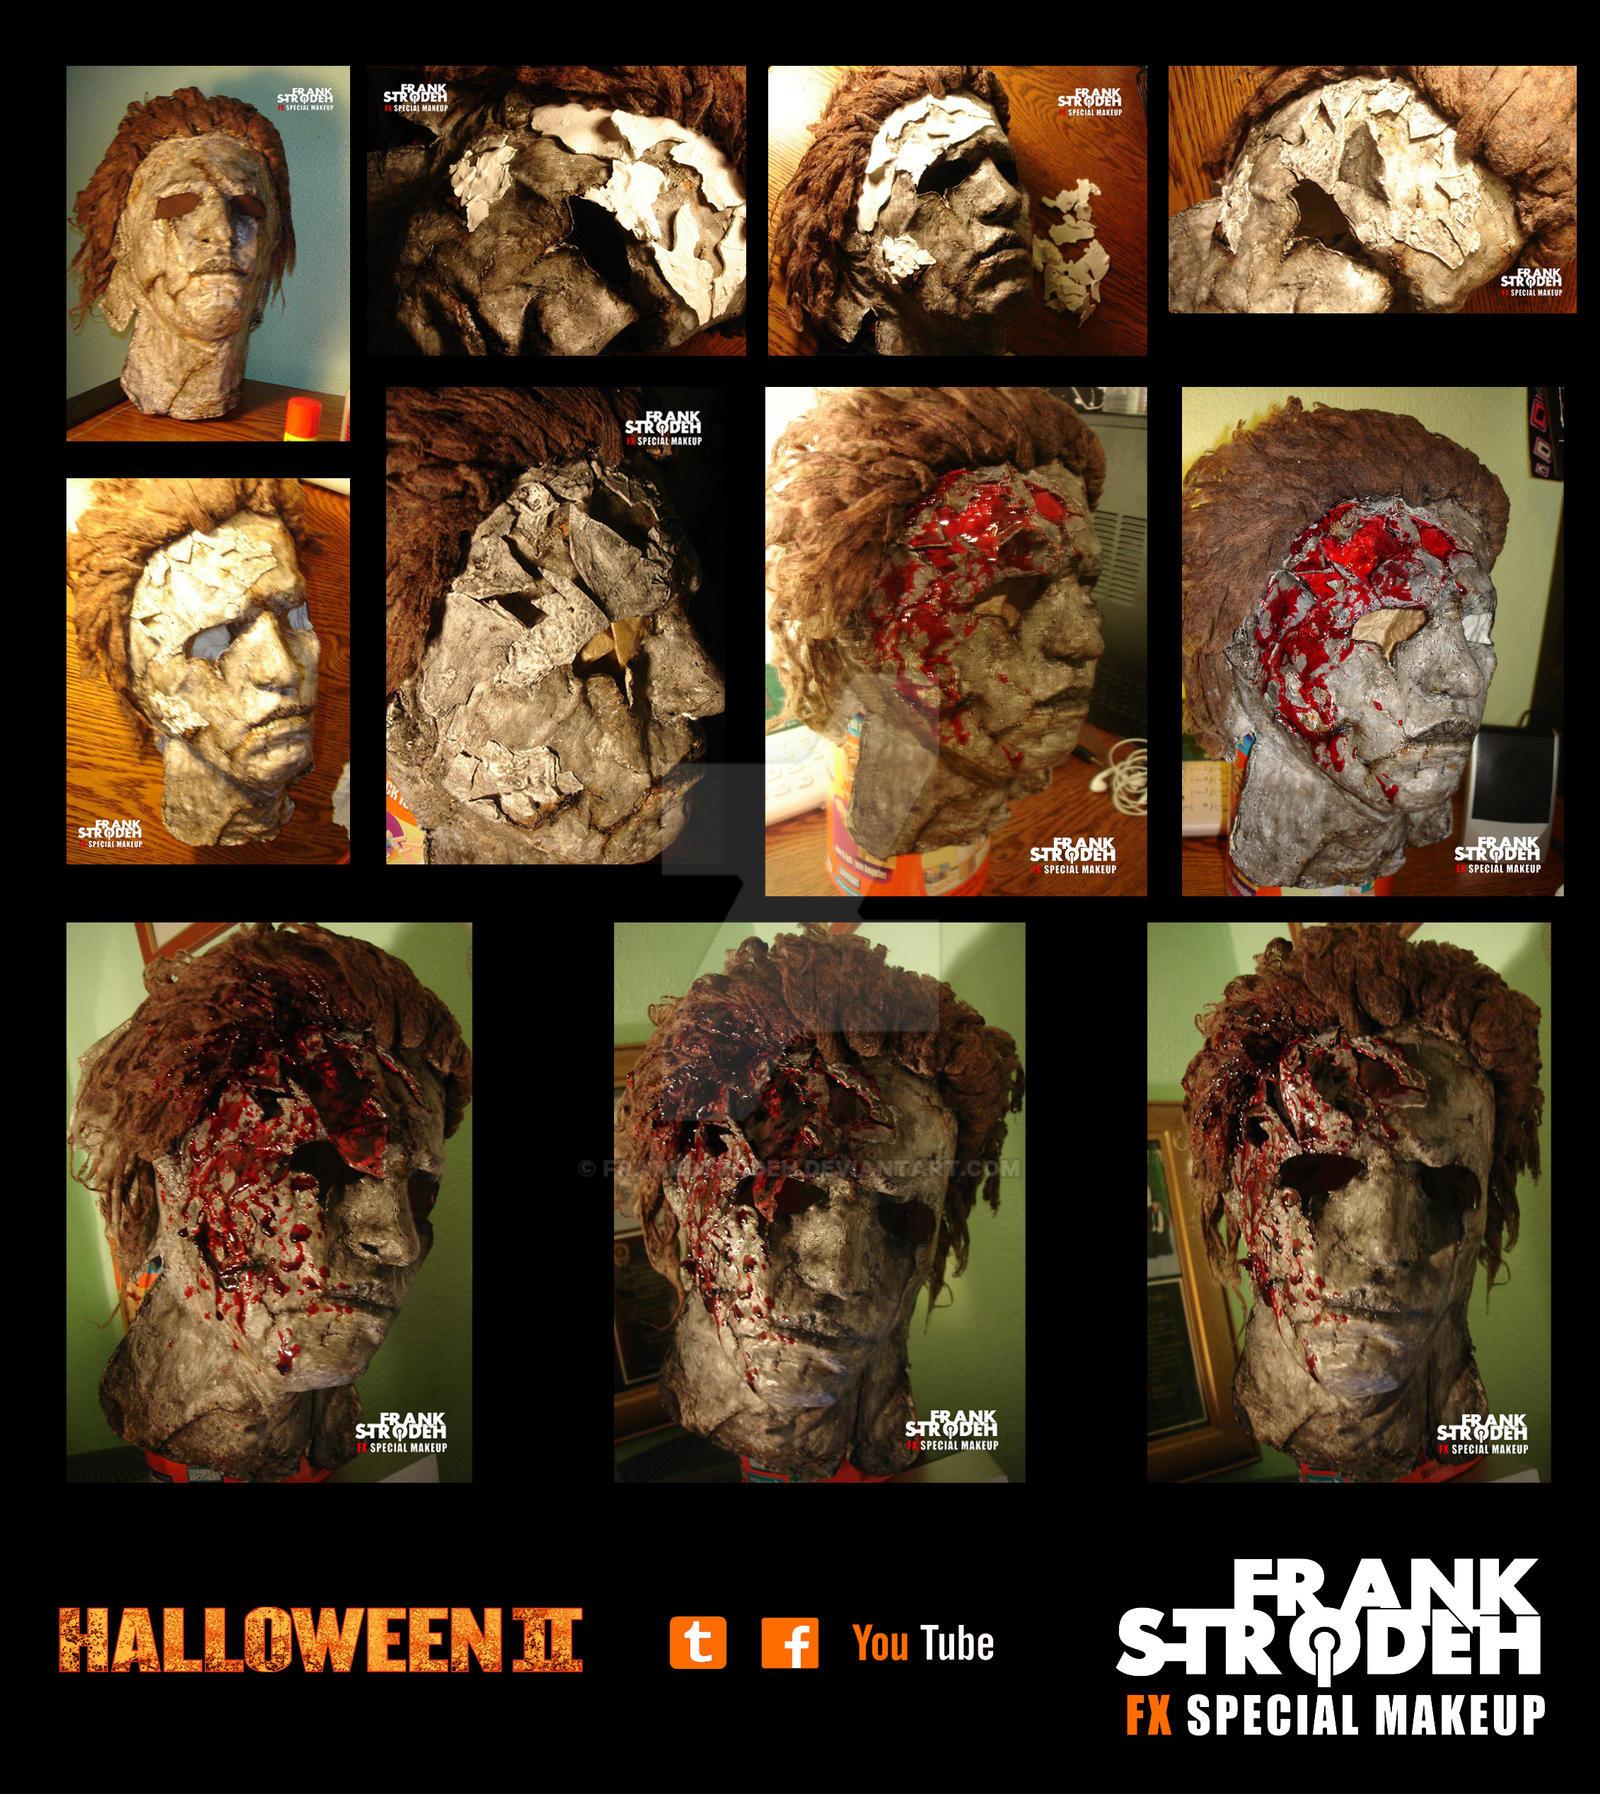 FRANK STRODEH) HALLOWEEN II Michael Myers Mask by frankstrodeh on ...